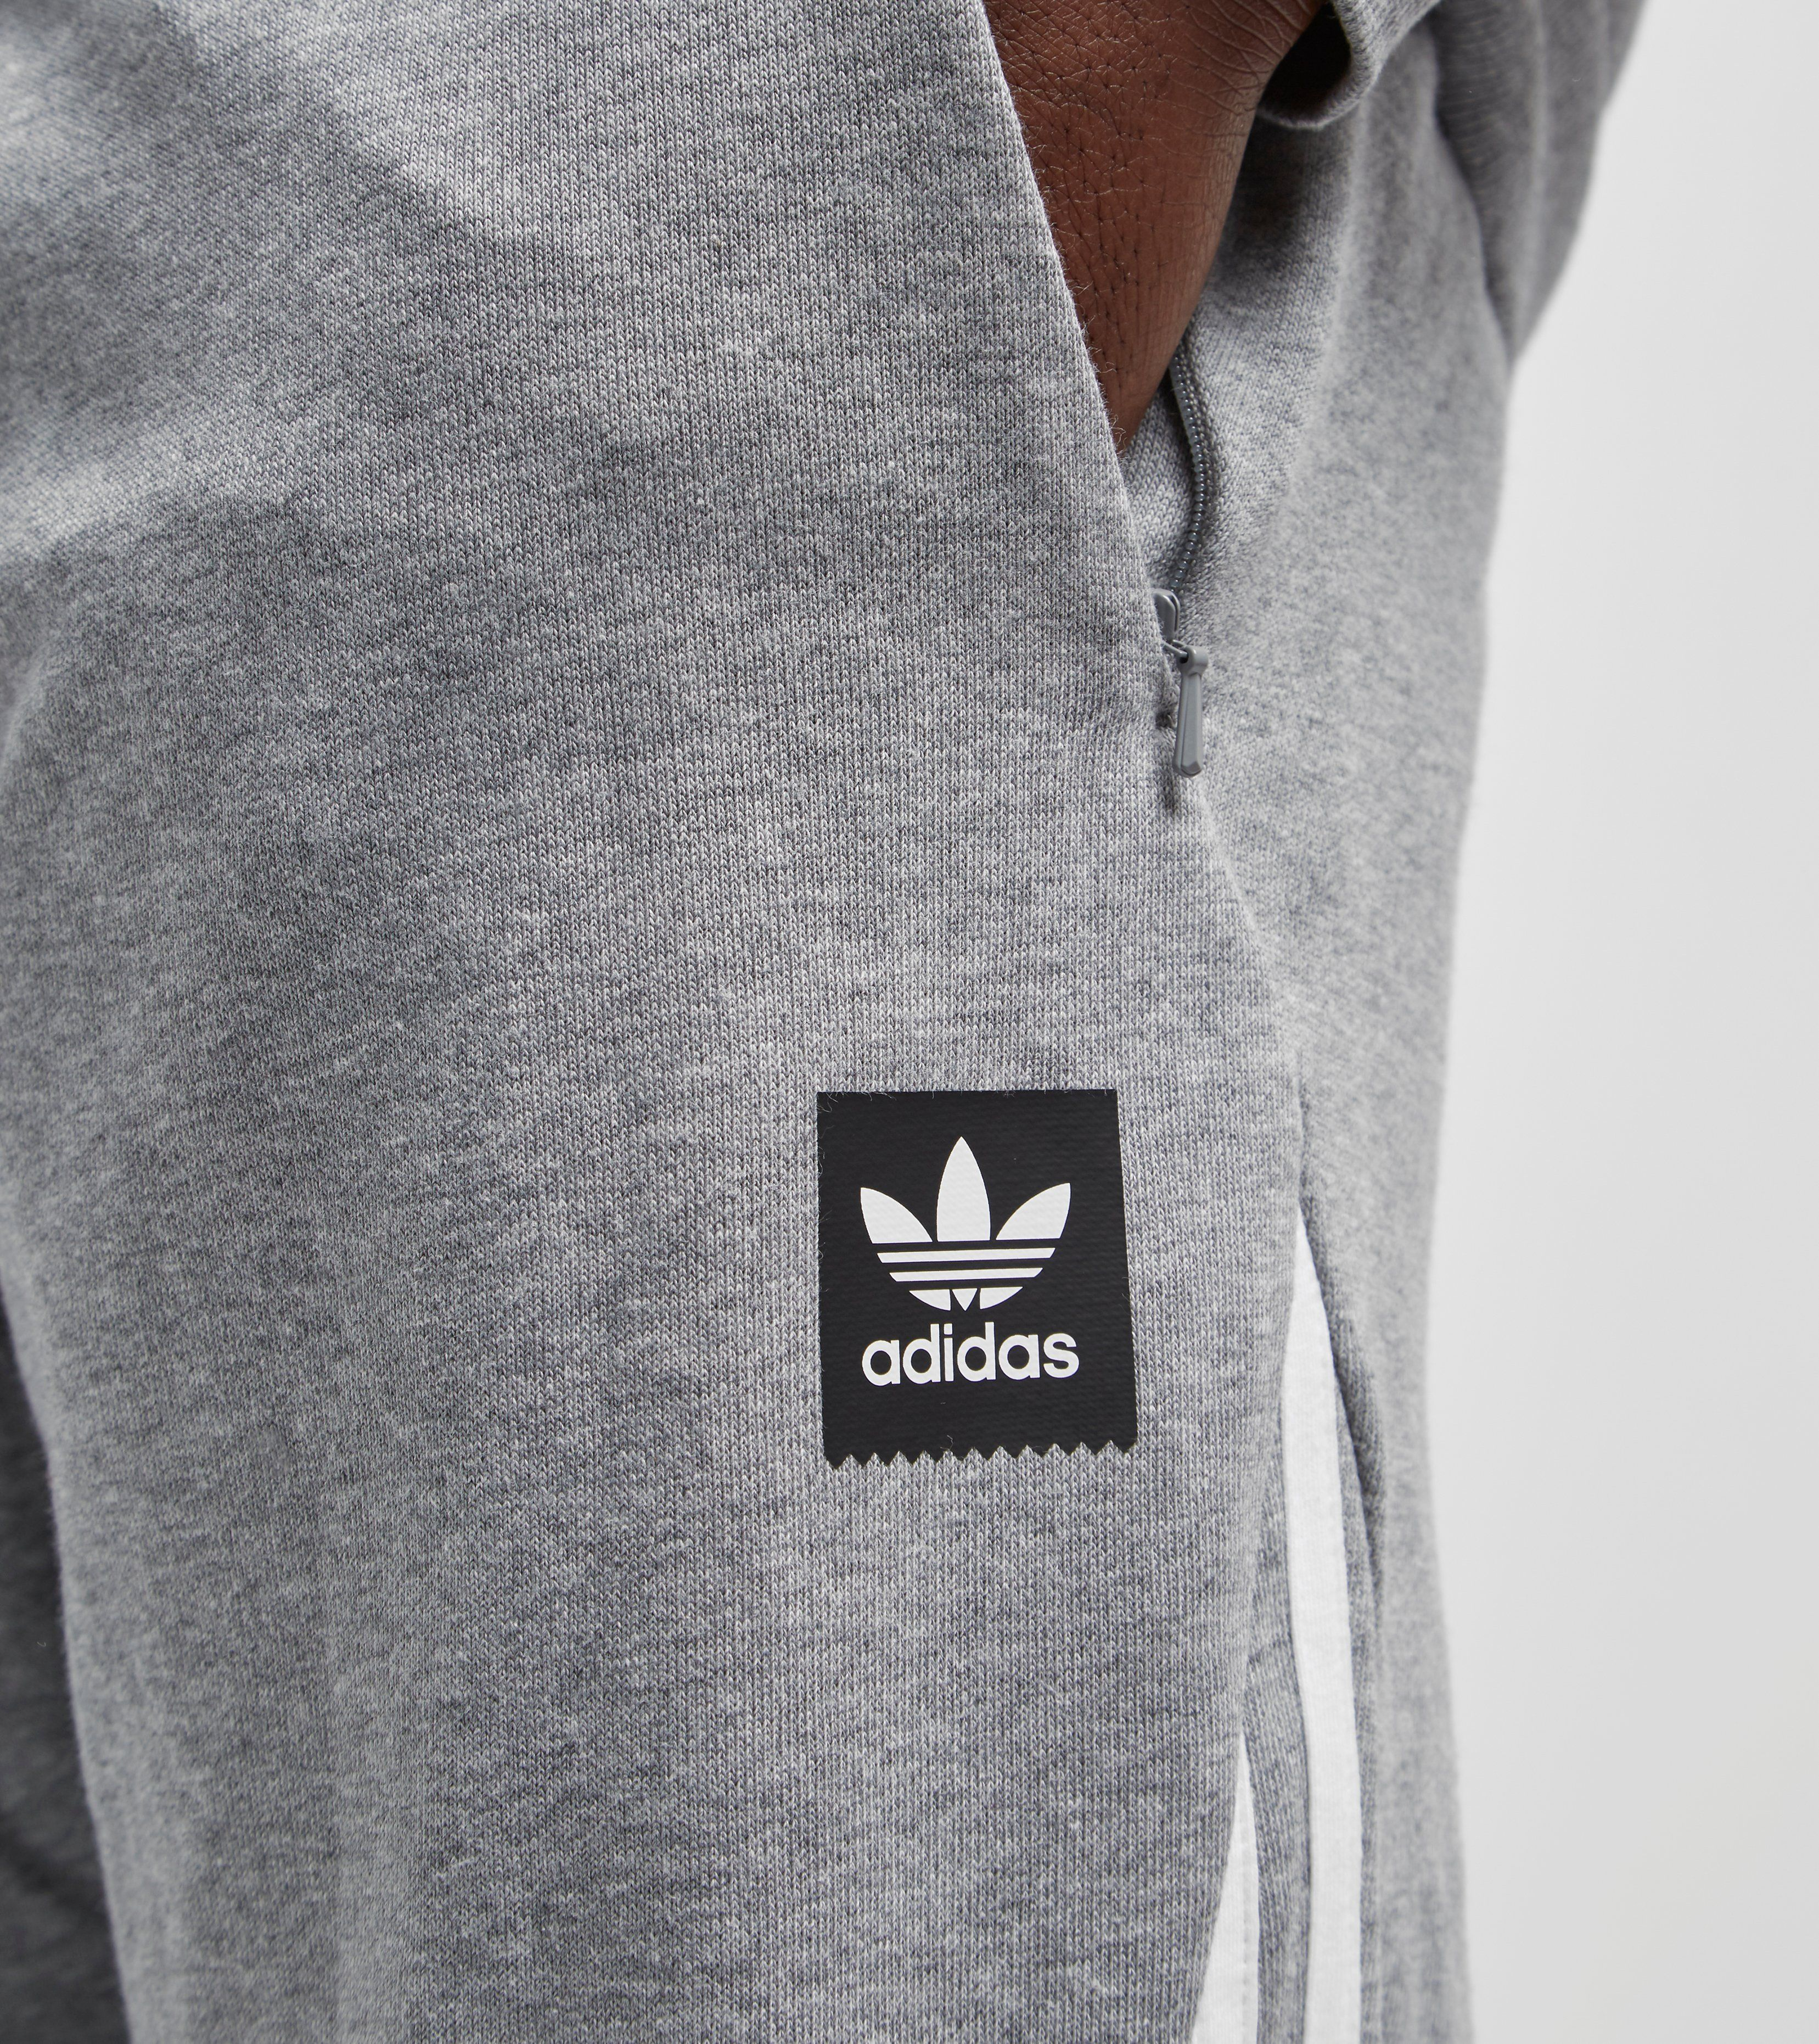 adidas Originals Insley Sweatpants